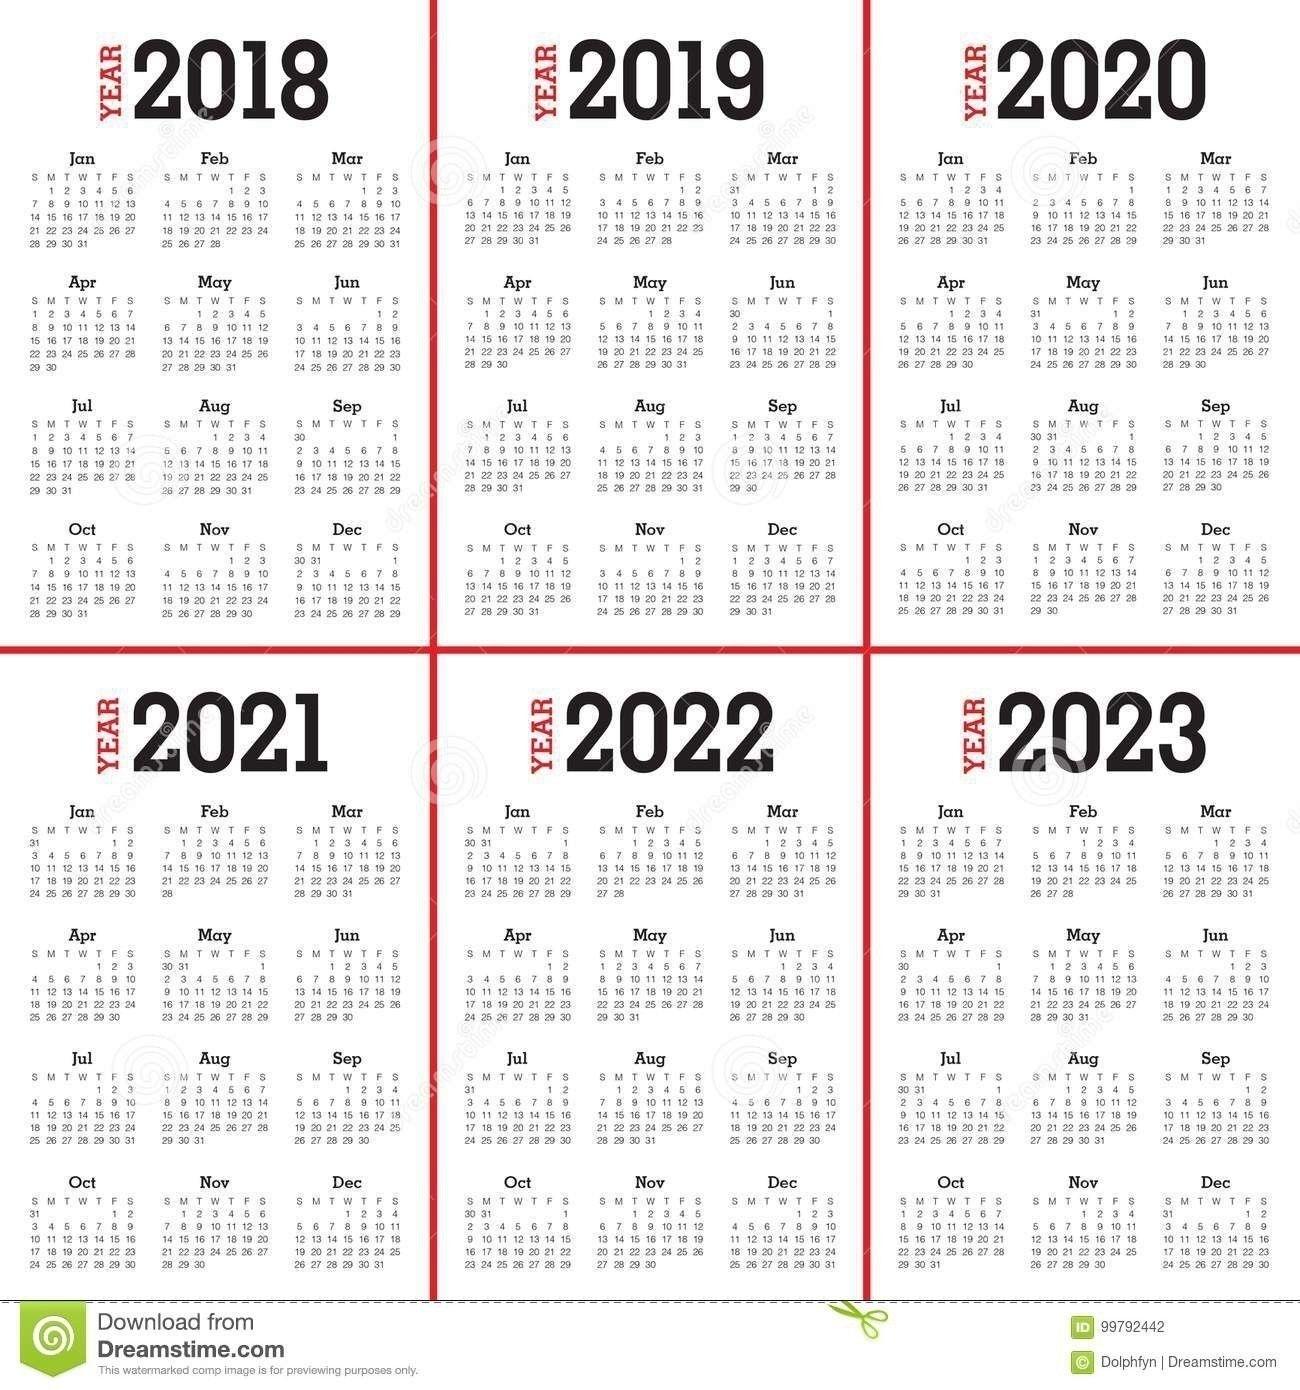 3 Year Calendar 2021 To 2023 In 2020   Calendar Printables